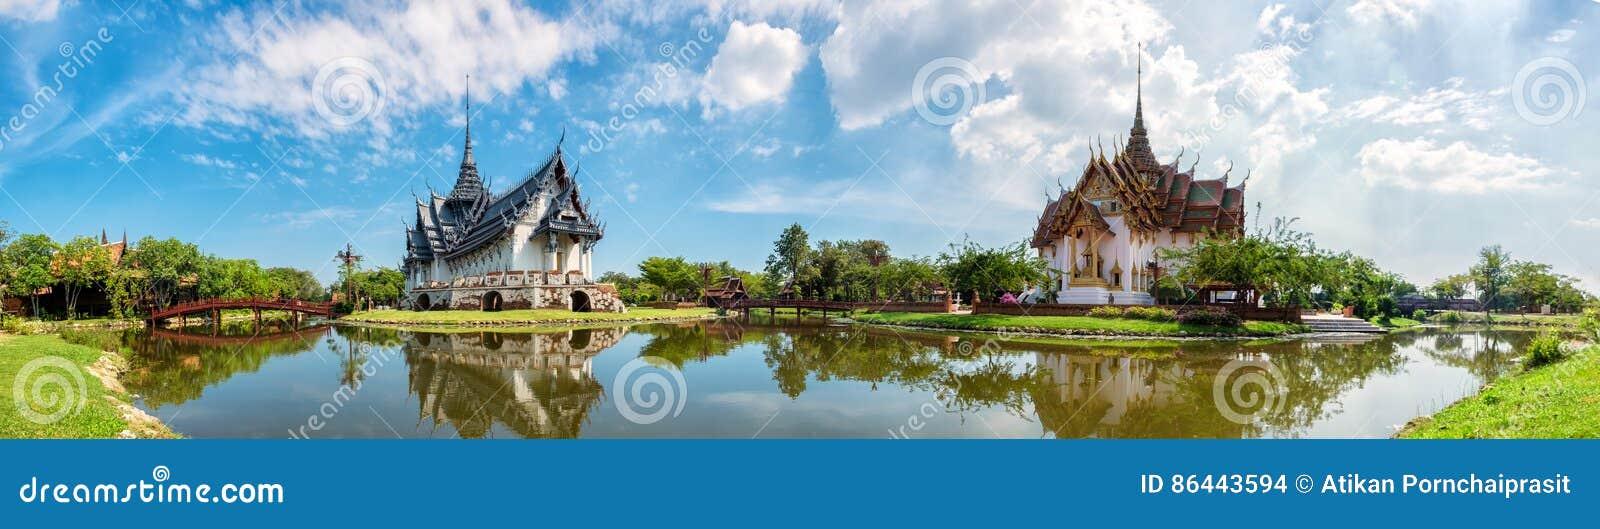 Sanphet Prasat slott, forntida stad, Bangkok,